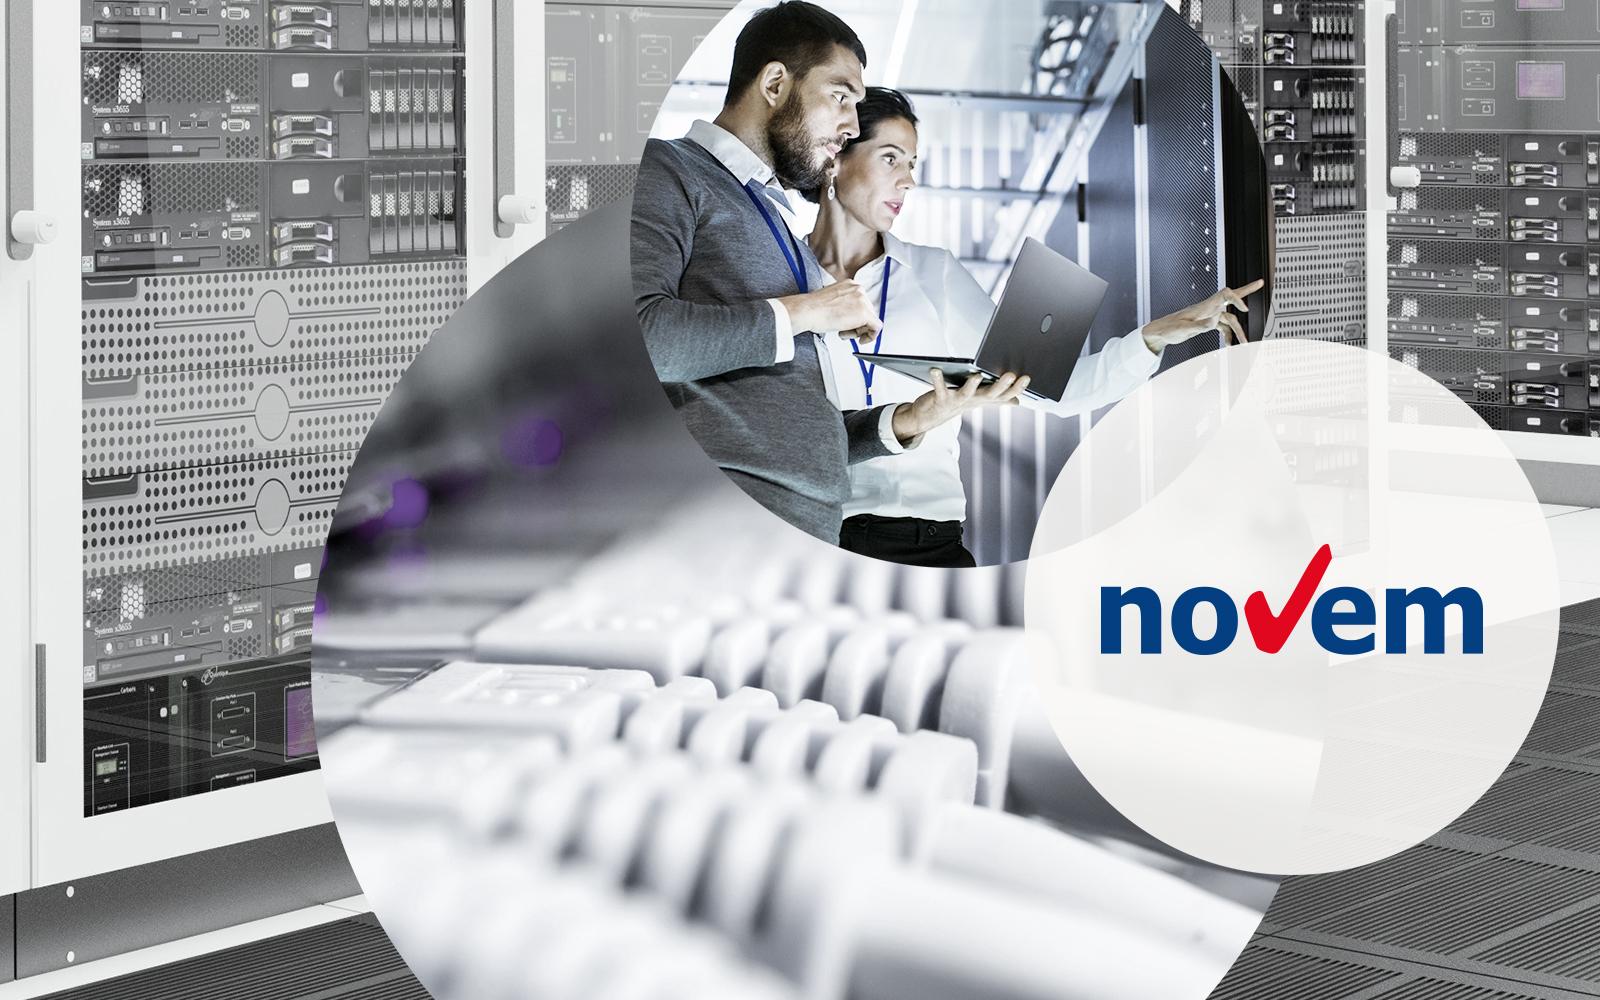 Logo of Business Analytics specialist novem who operates under the new name valantic